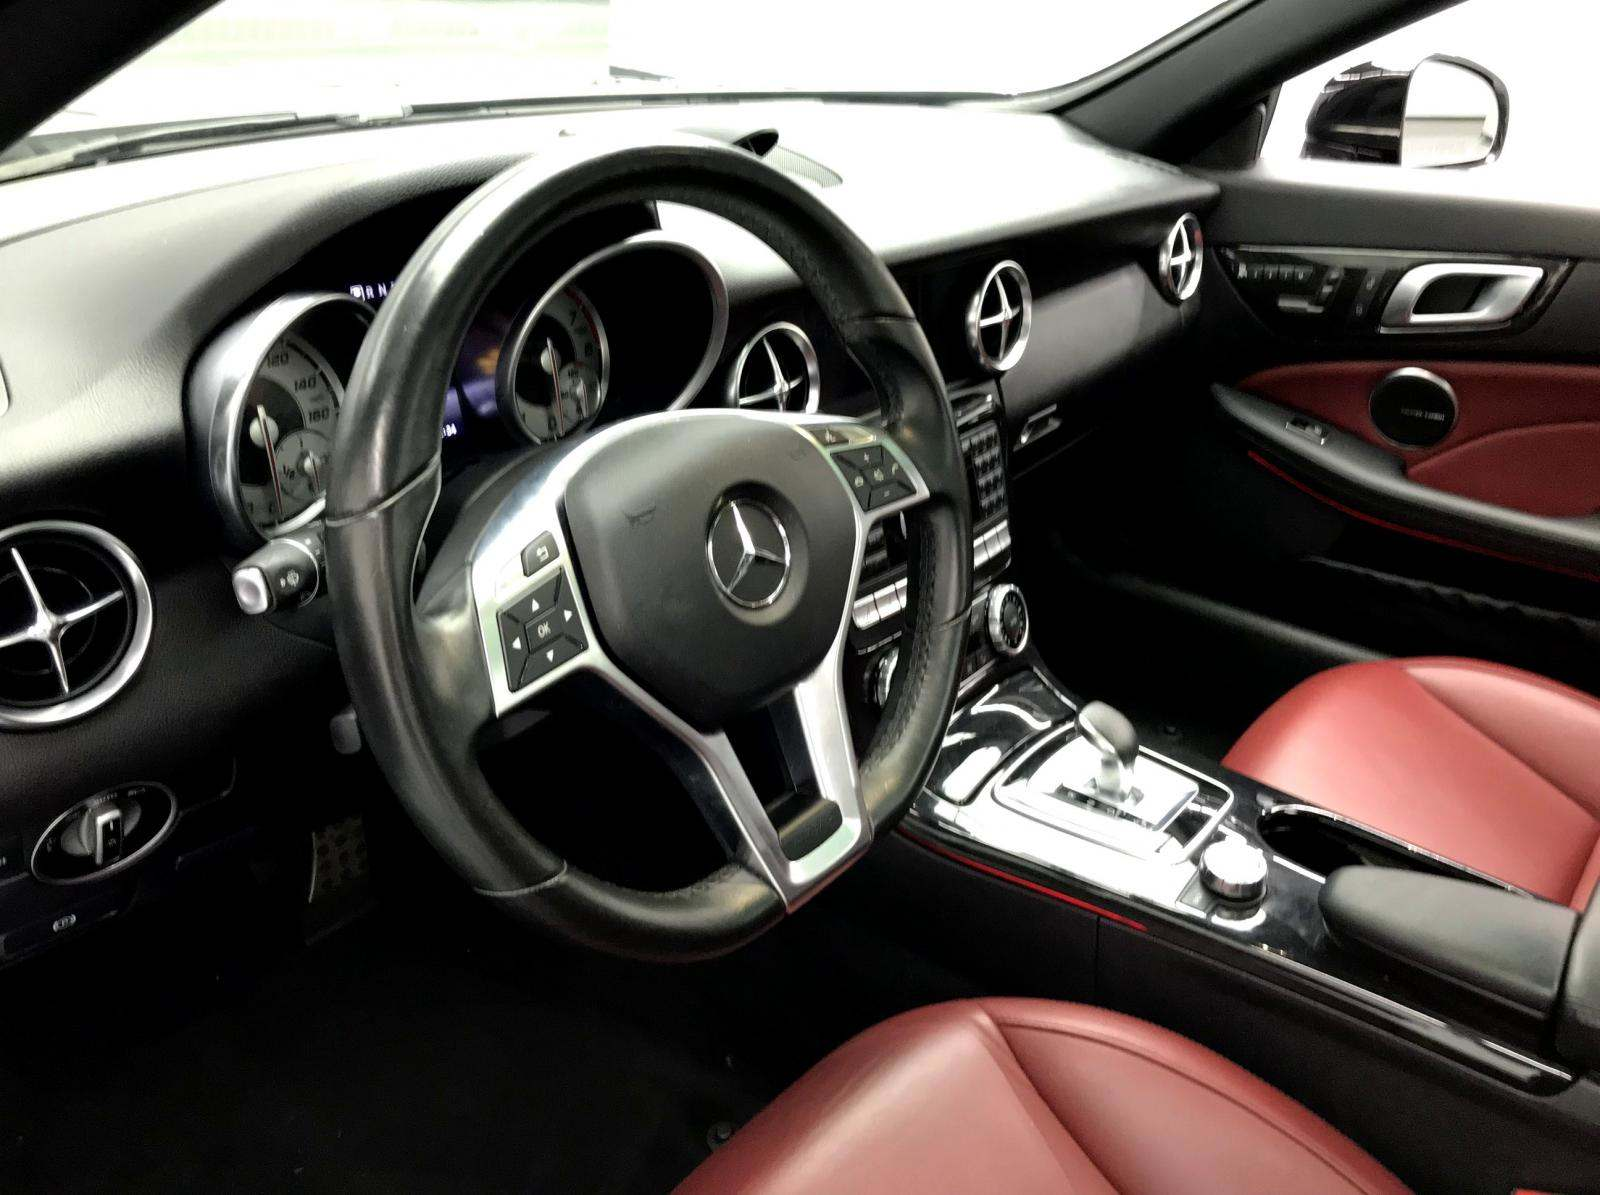 used Mercedes-Benz SLK-Class 2016 vin: WDDPK3JA4GF122259